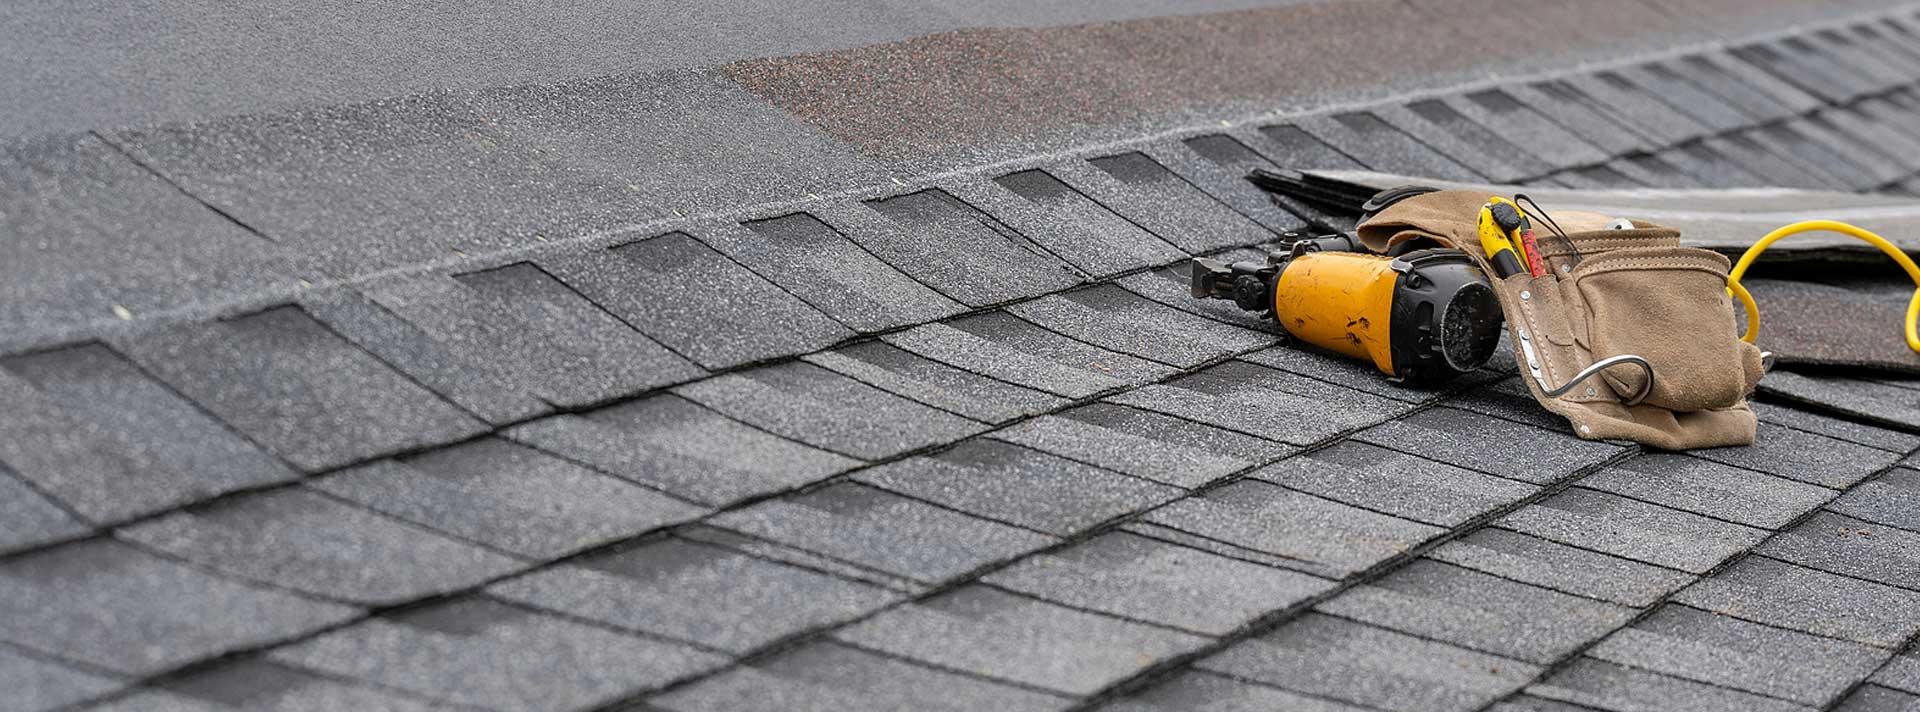 Roofing Dayton Ohio